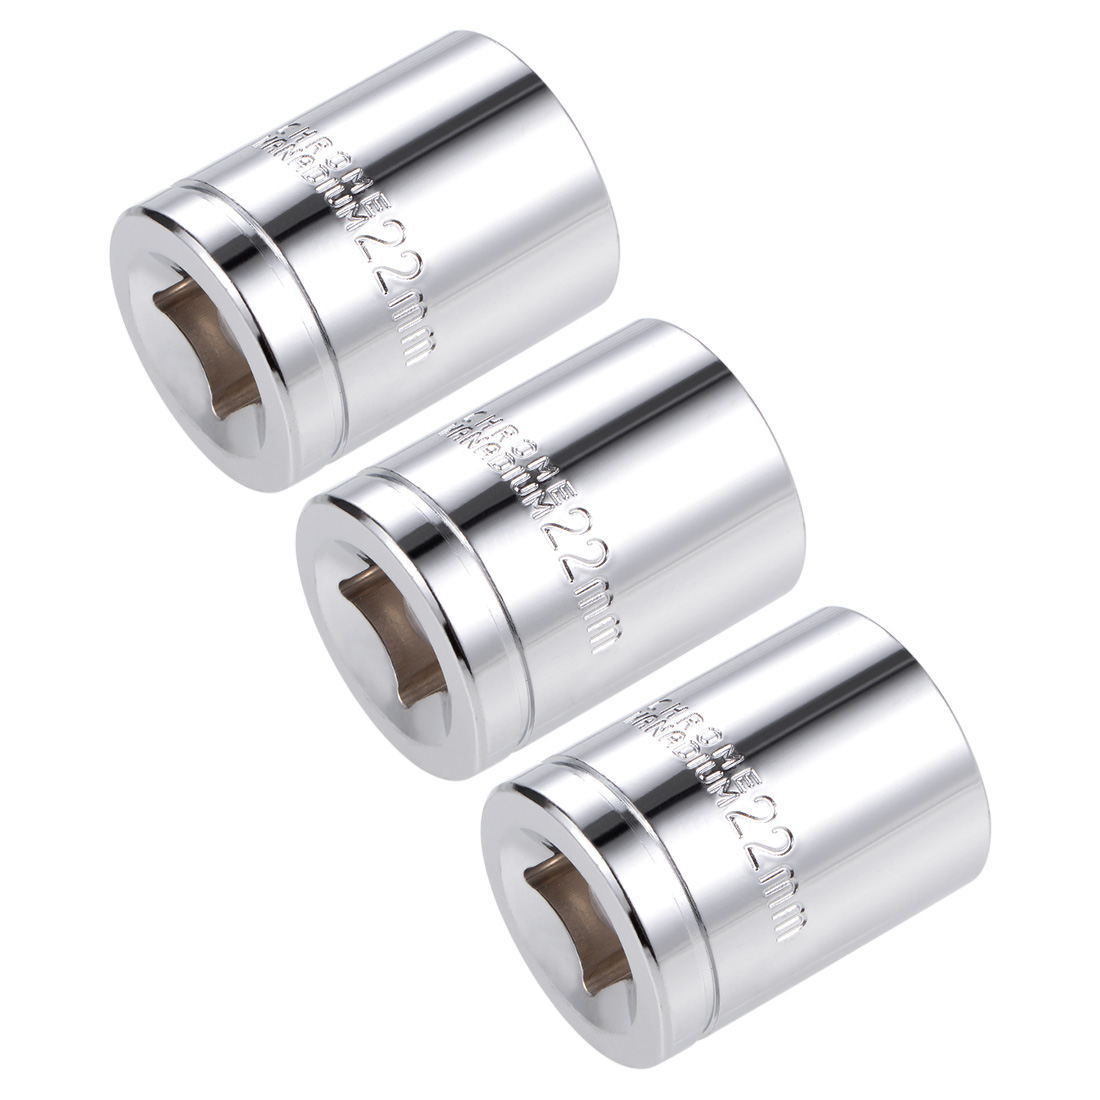 1/2-inch Drive E22 Universal Spline Socket Shallow 12 Point Cr-V Steel 3 pcs